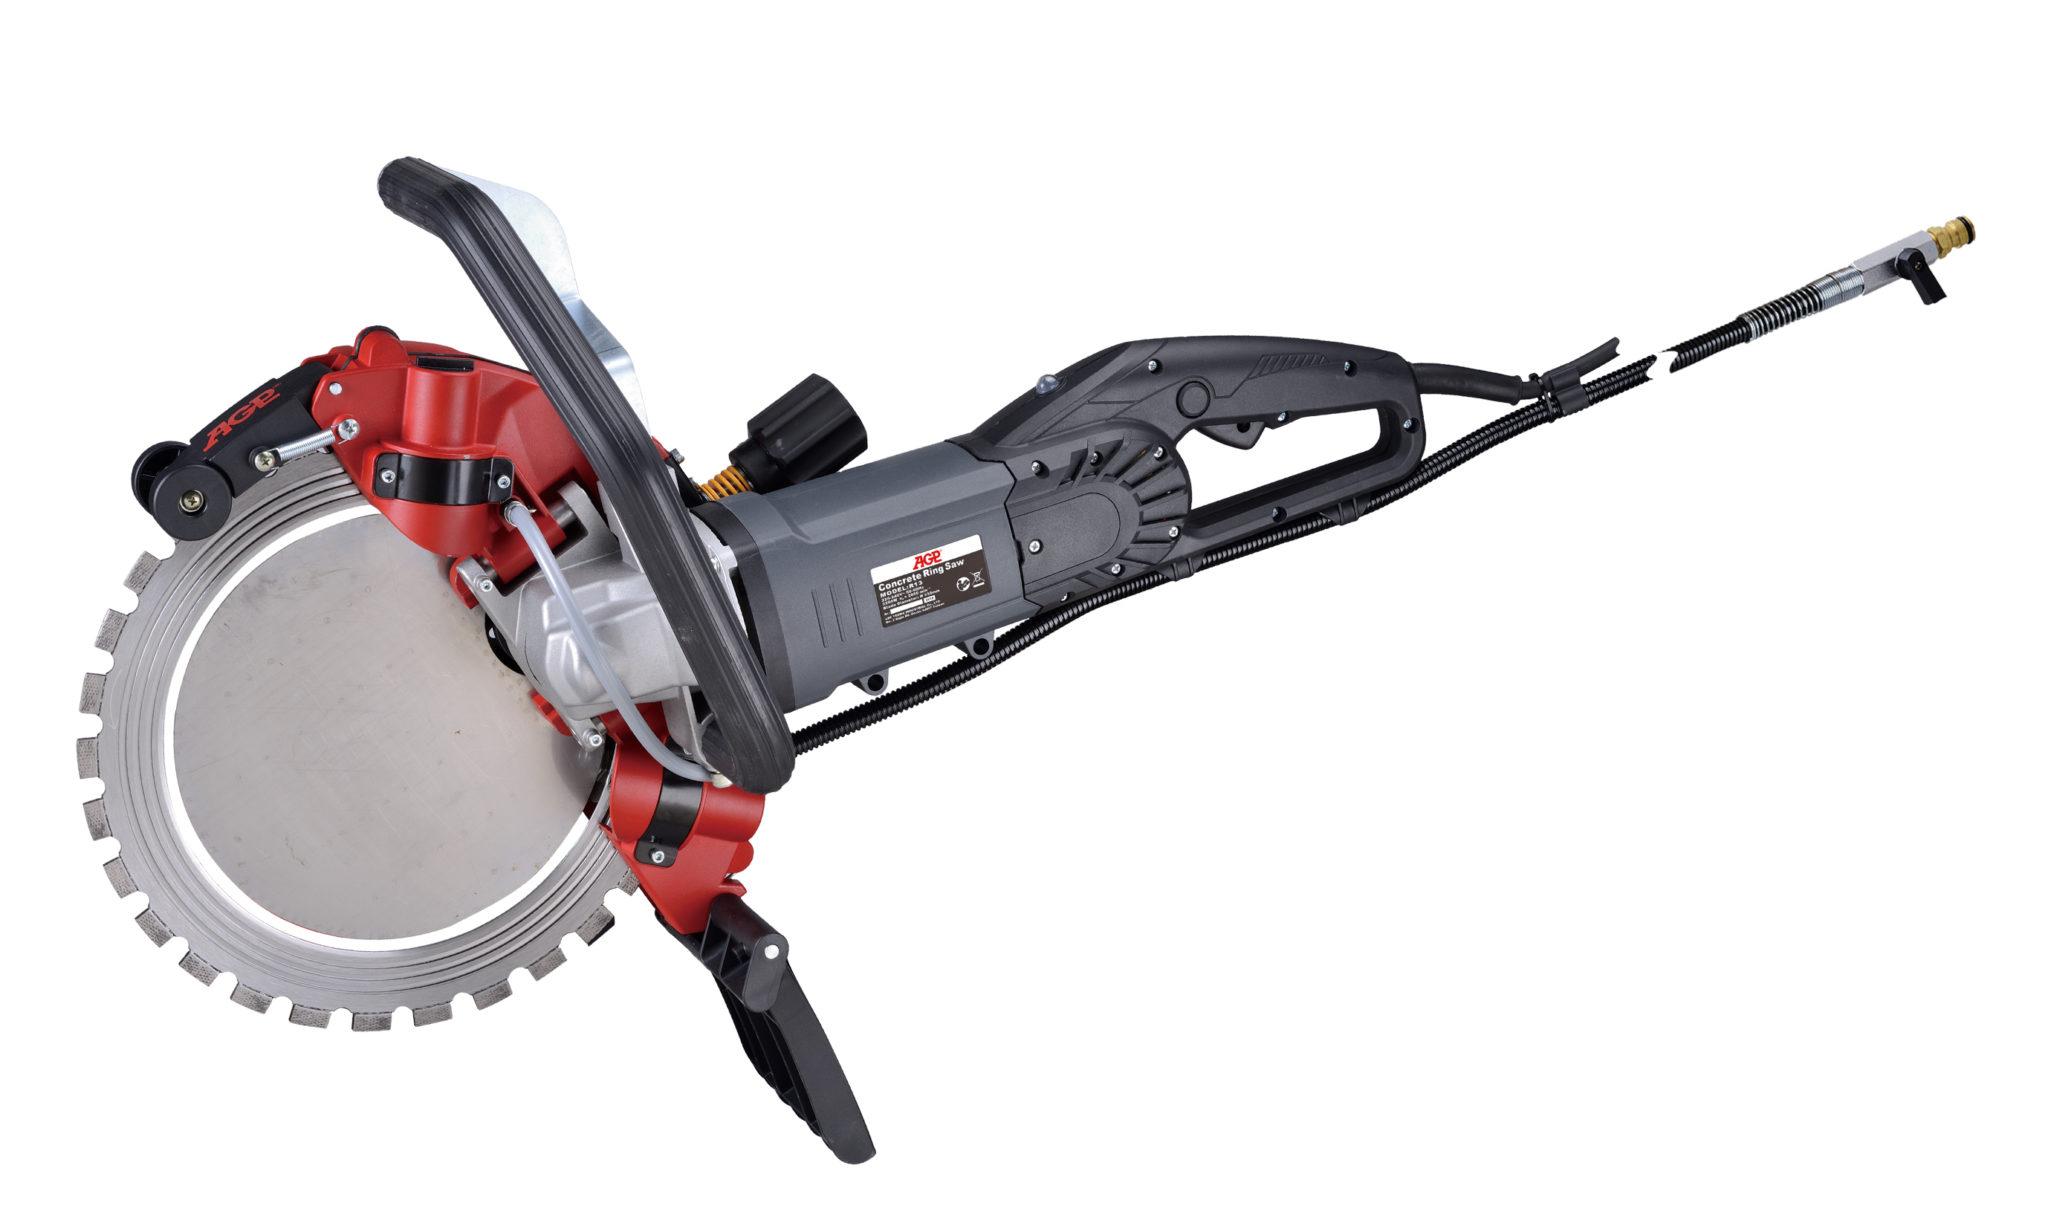 Dia - Ringsäge AGP R13 / 230V/3200W / S-Tiefe 220mm / Blattdurchmesser Ø330mm / Gewicht: 12.6kg